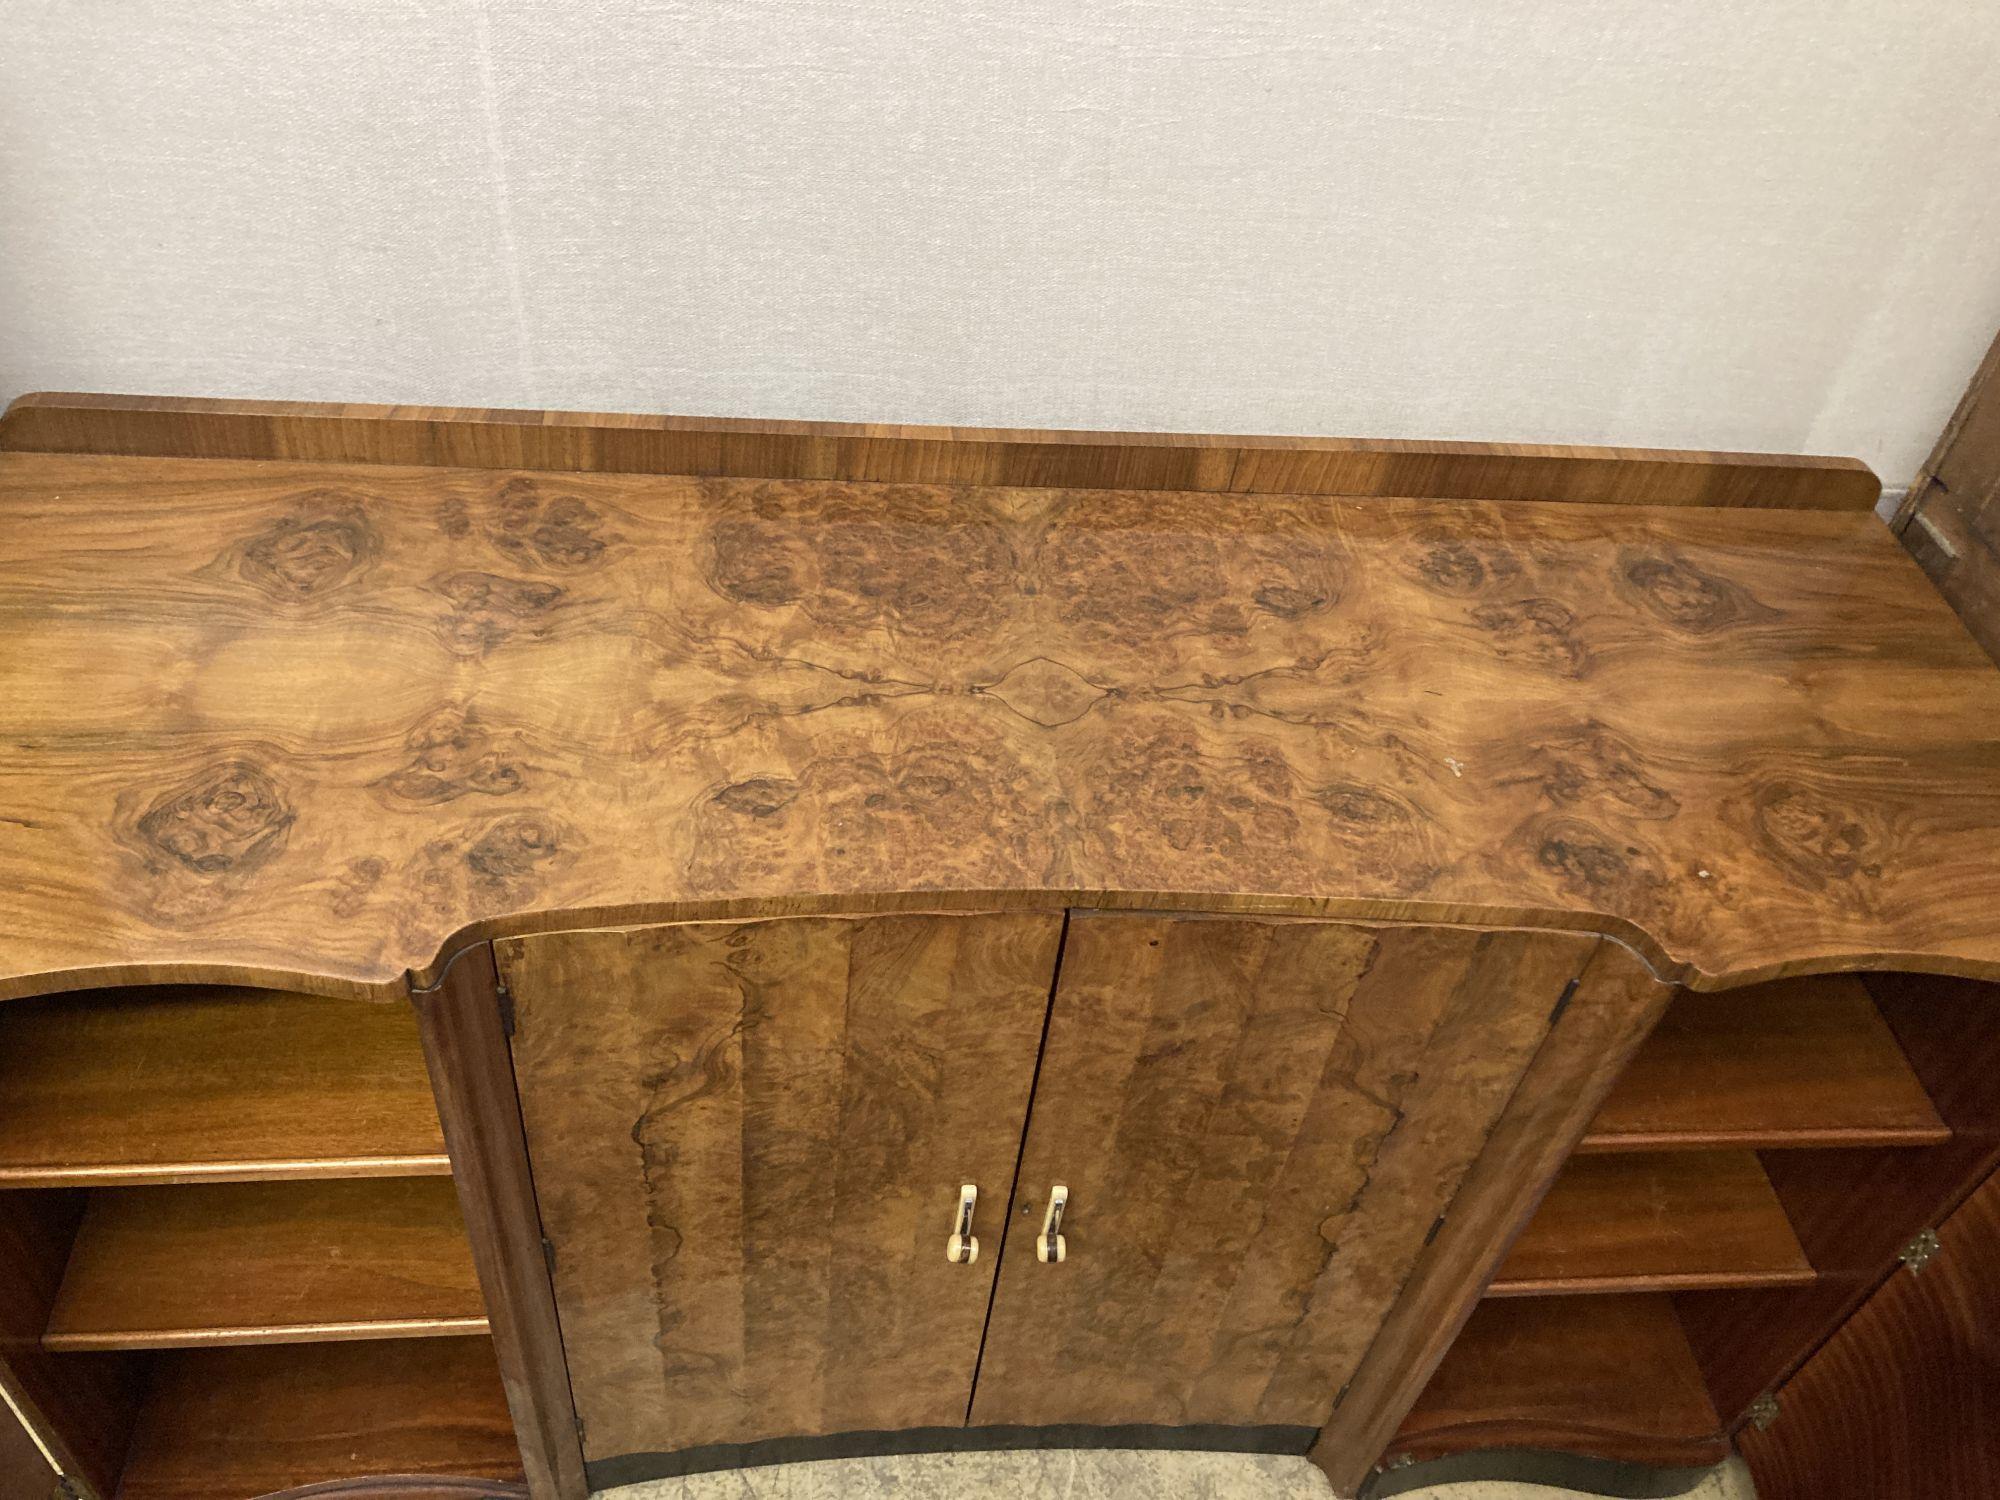 An Art Deco figured walnut sideboard, width 168cm depth 58cm height 98cm - Image 3 of 3